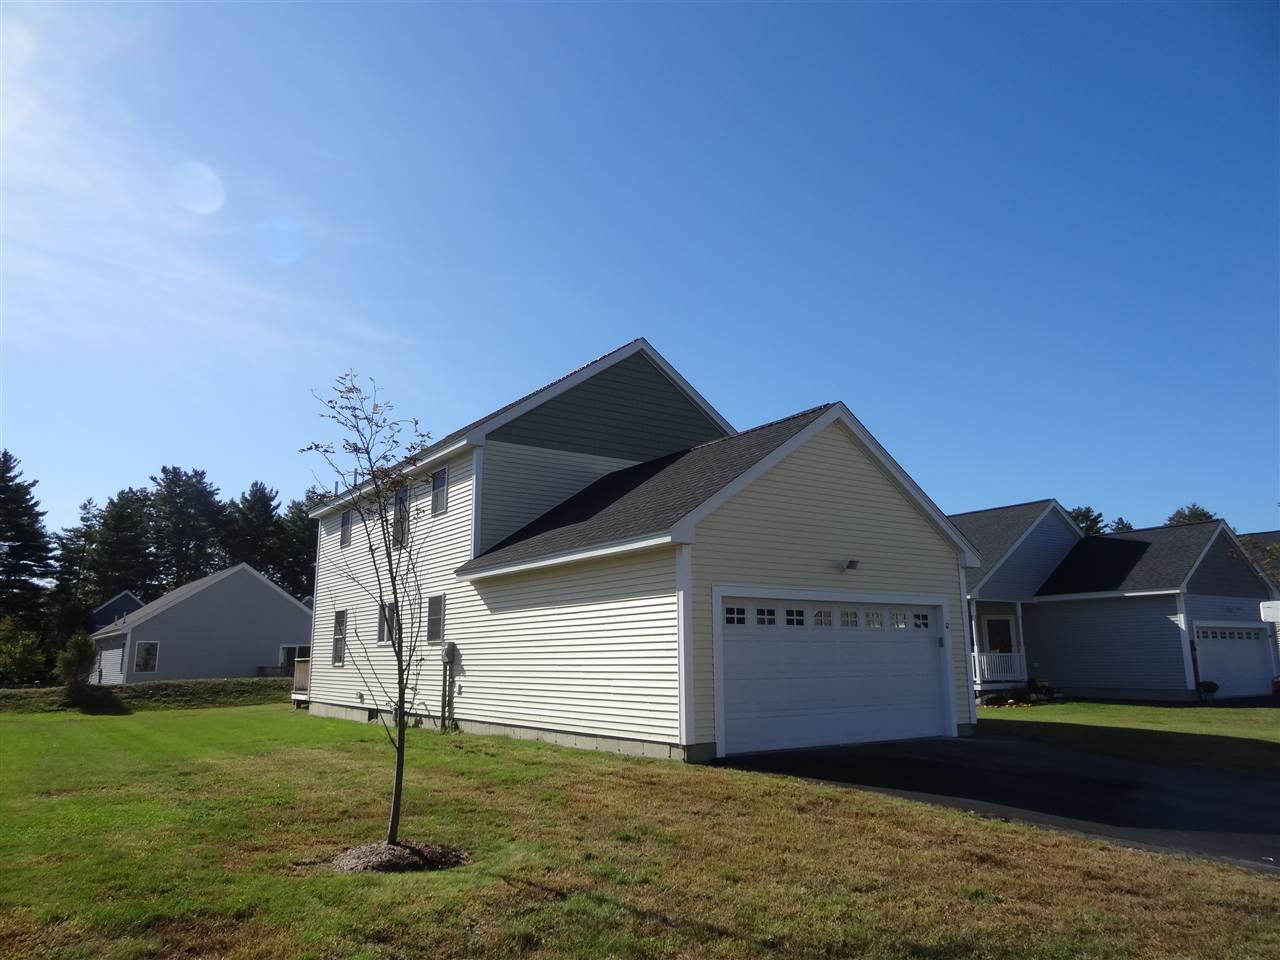 Real Estate for Sale, ListingId: 30512118, Concord,NH03303